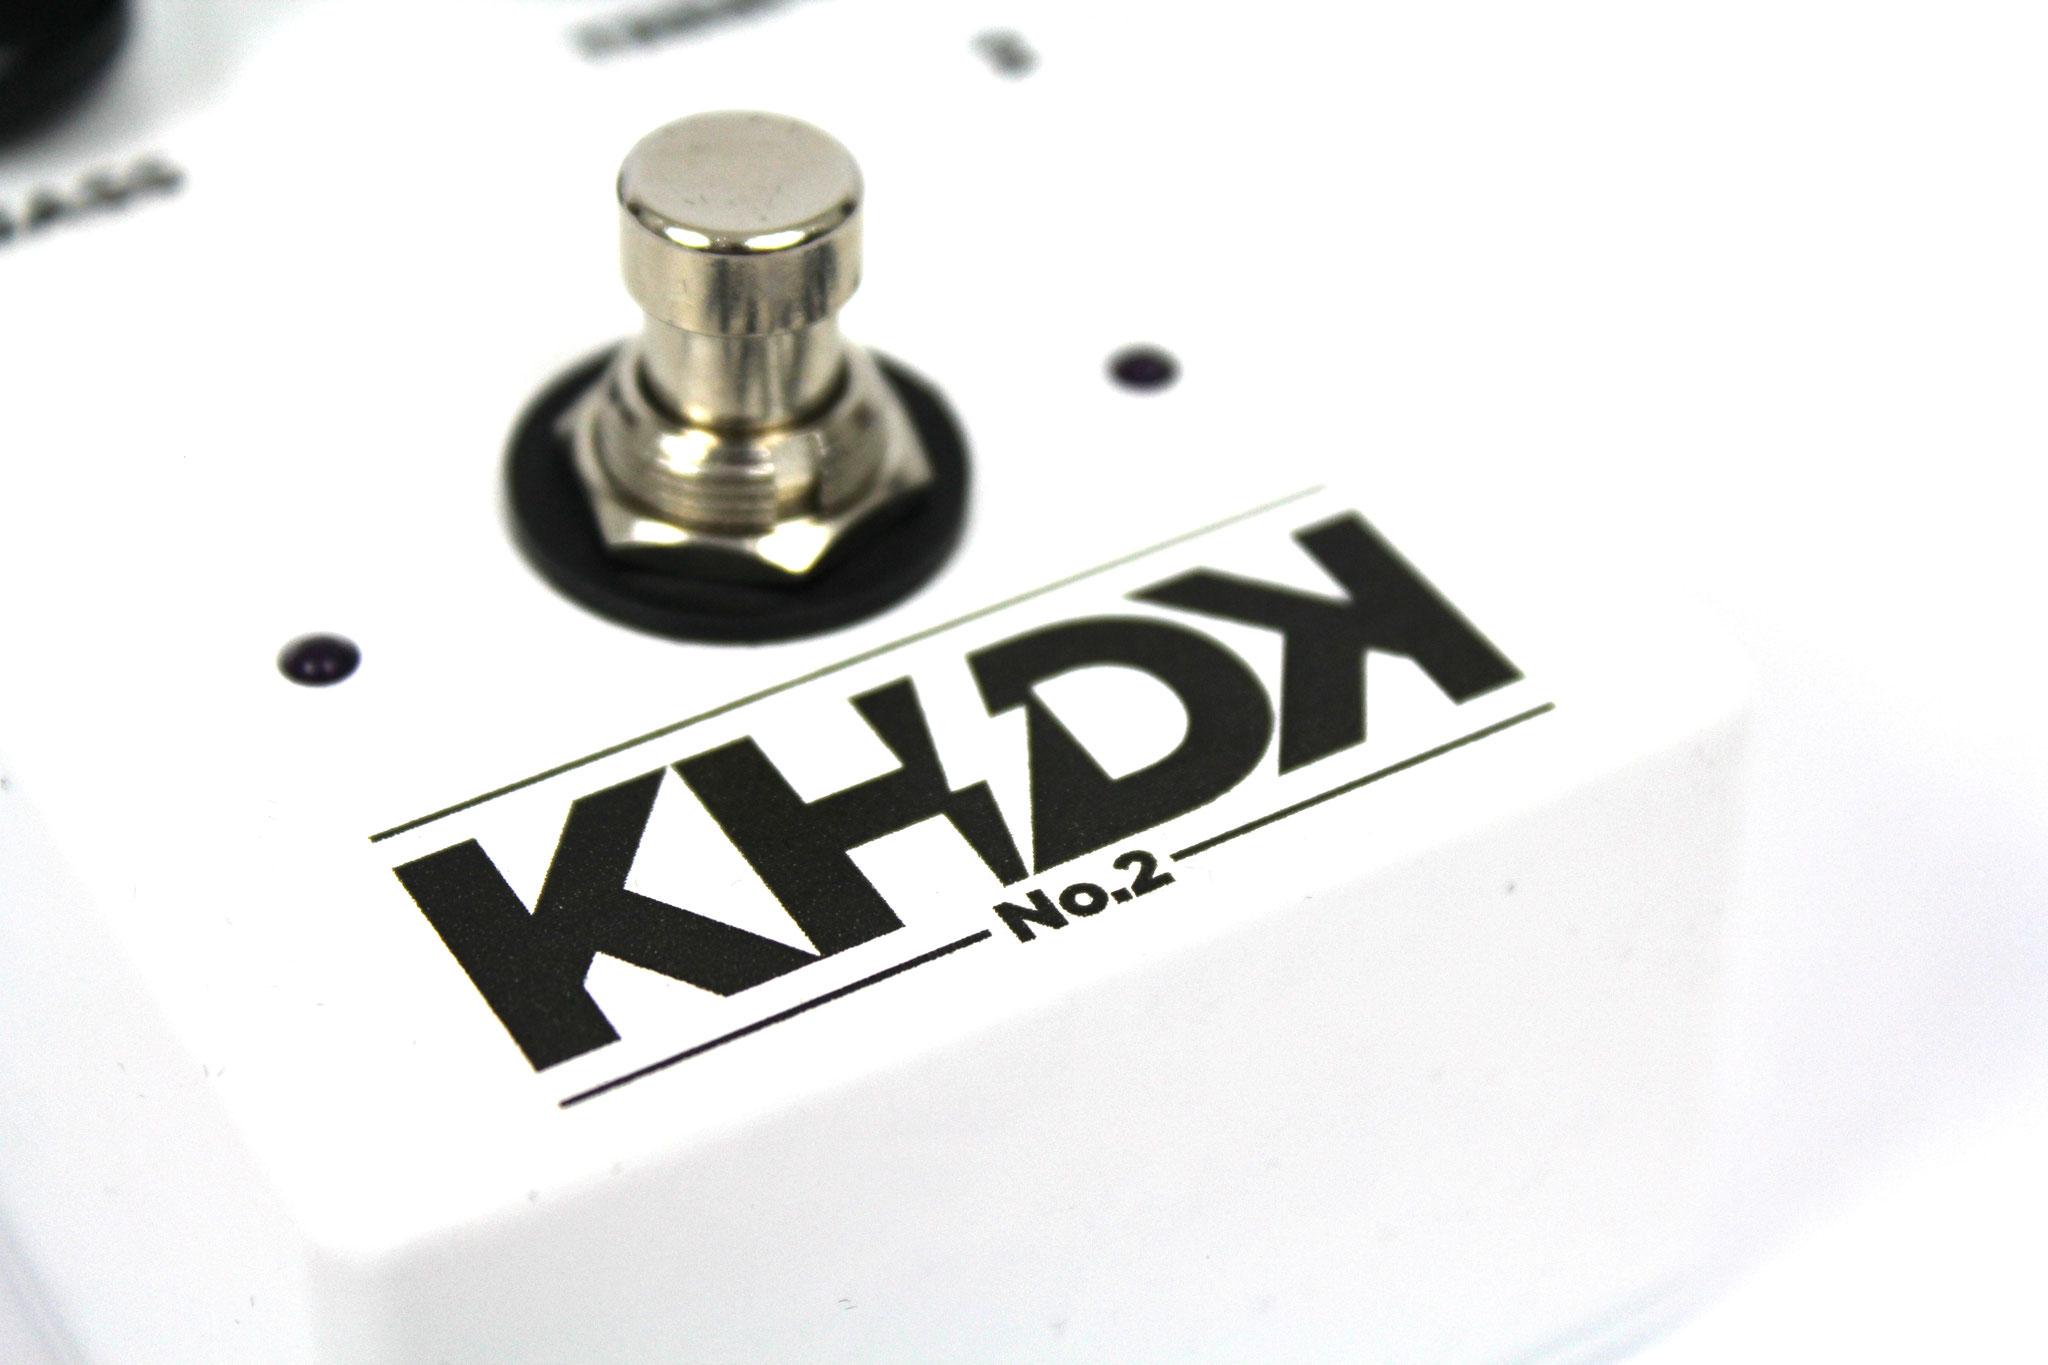 KHDK No. 2 Clean Boost